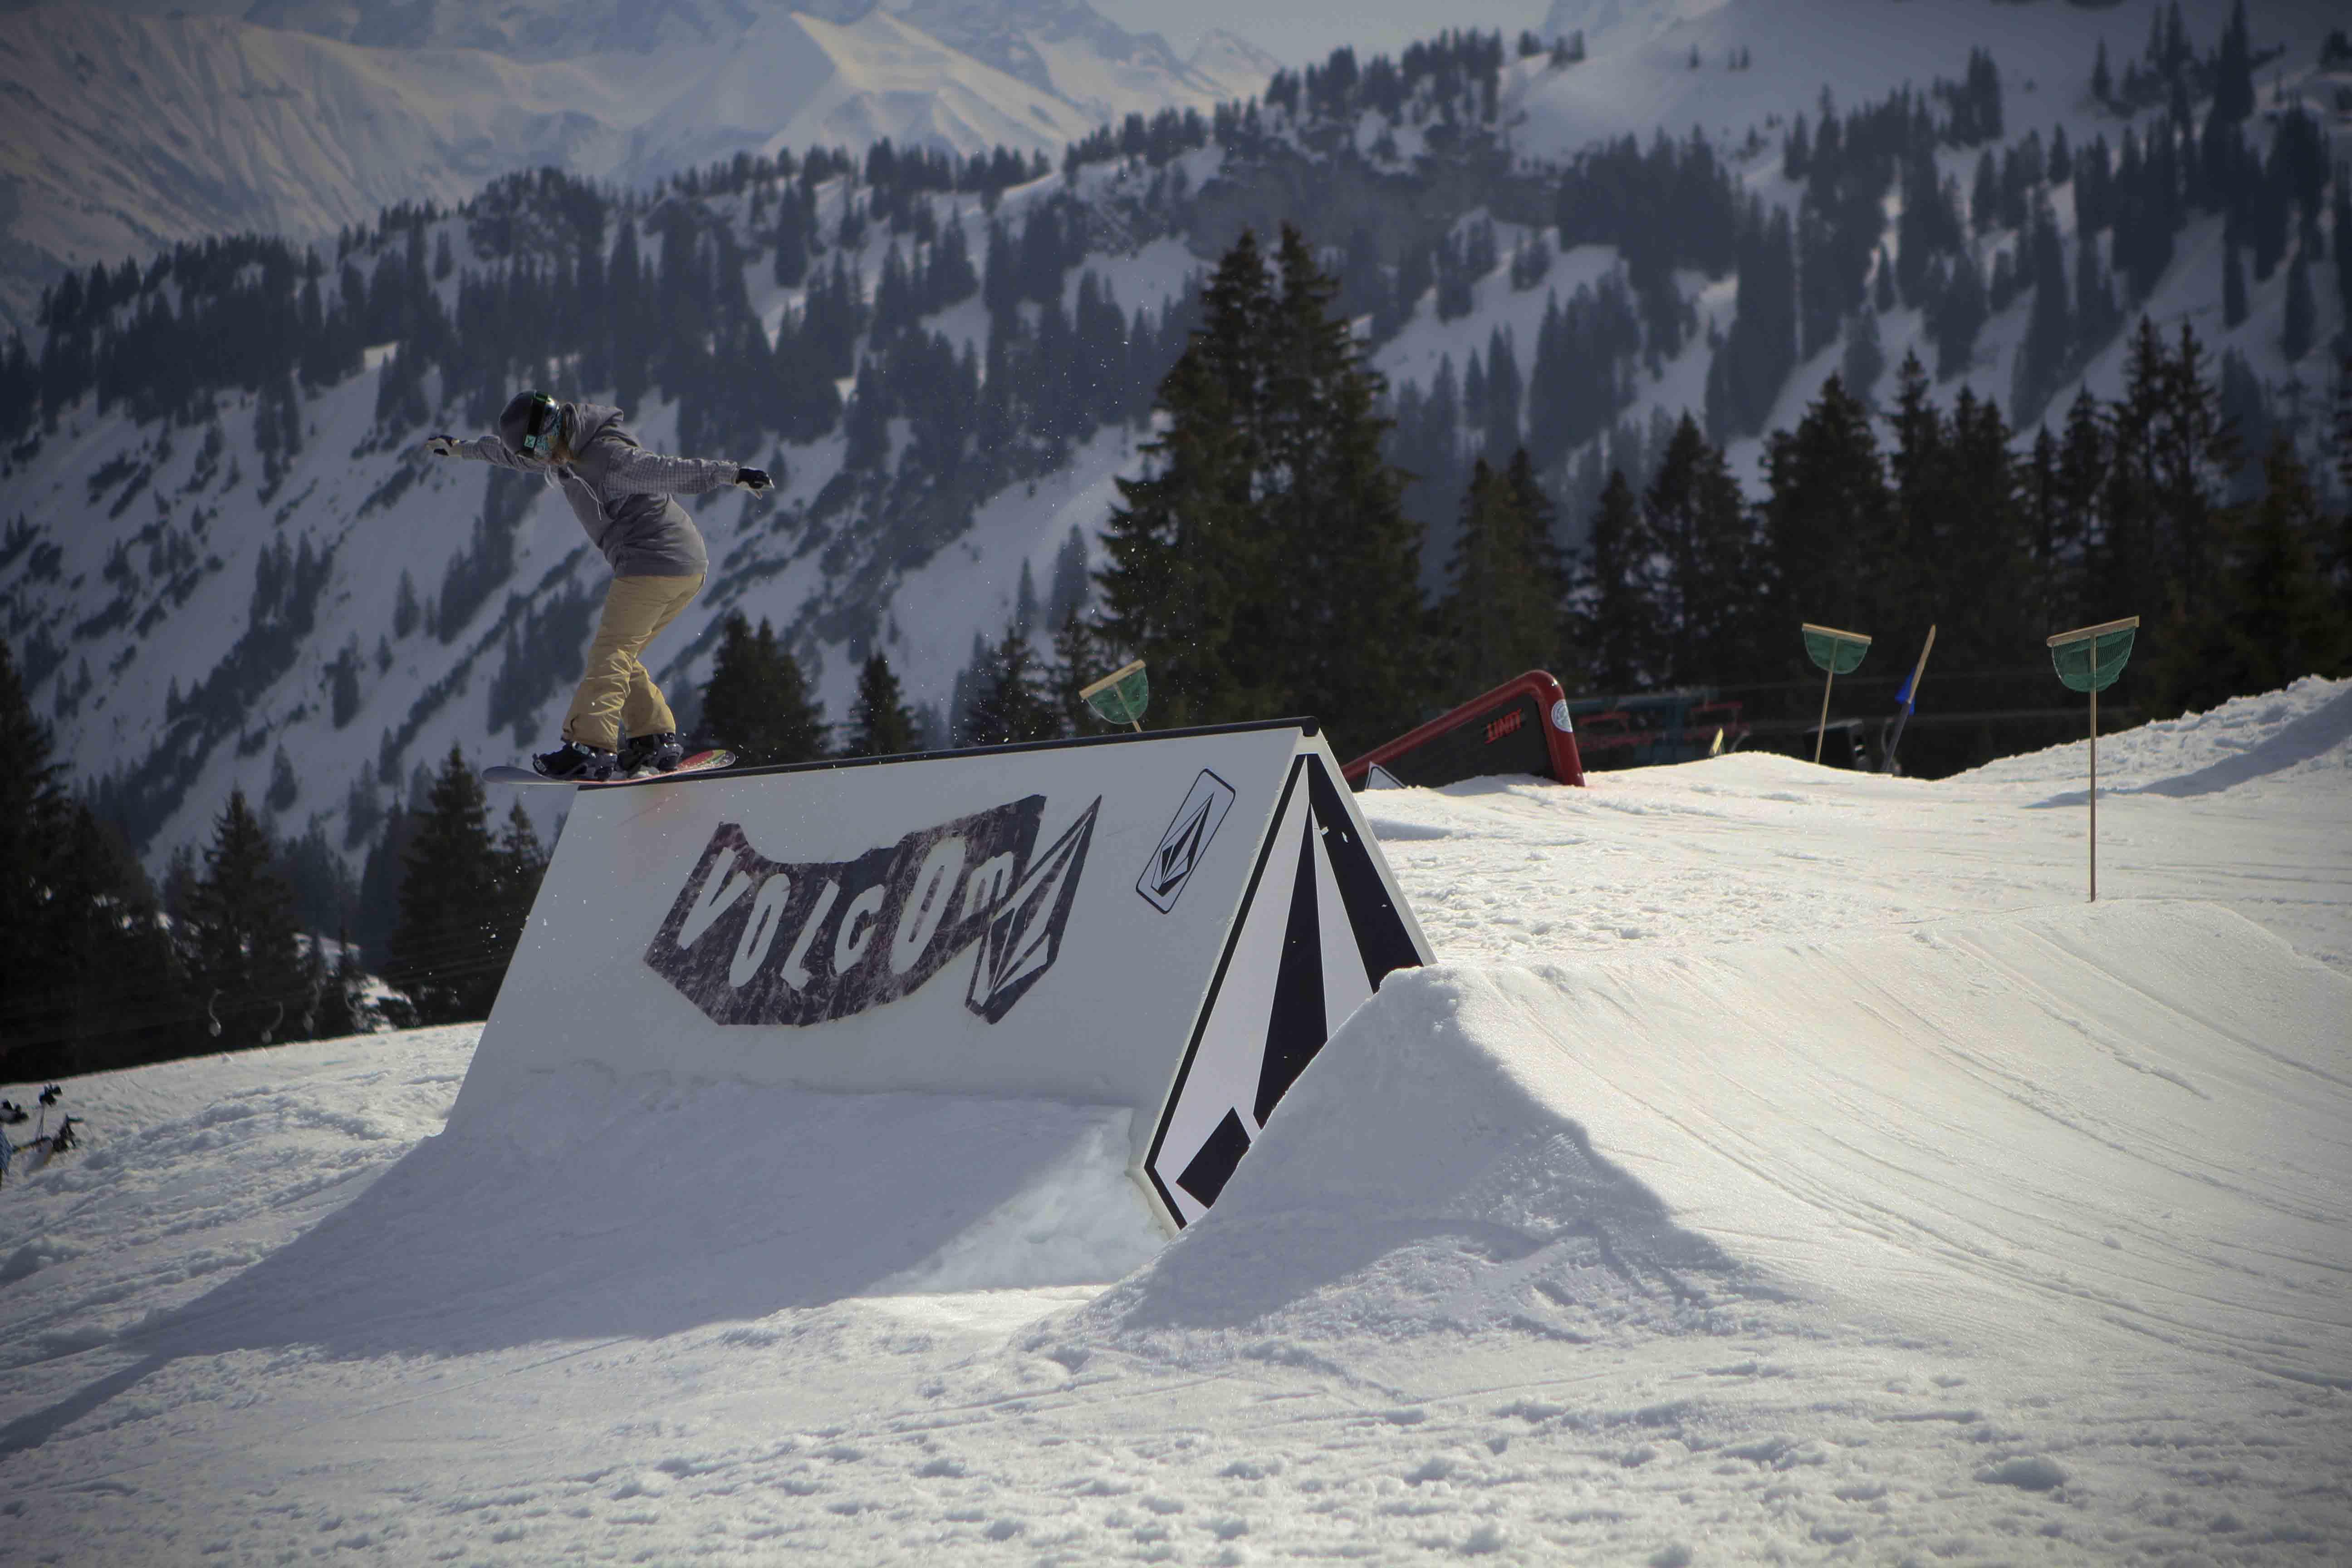 Frontside Lipslide in Grasgehren beim PBRJ / Photo: Max Born